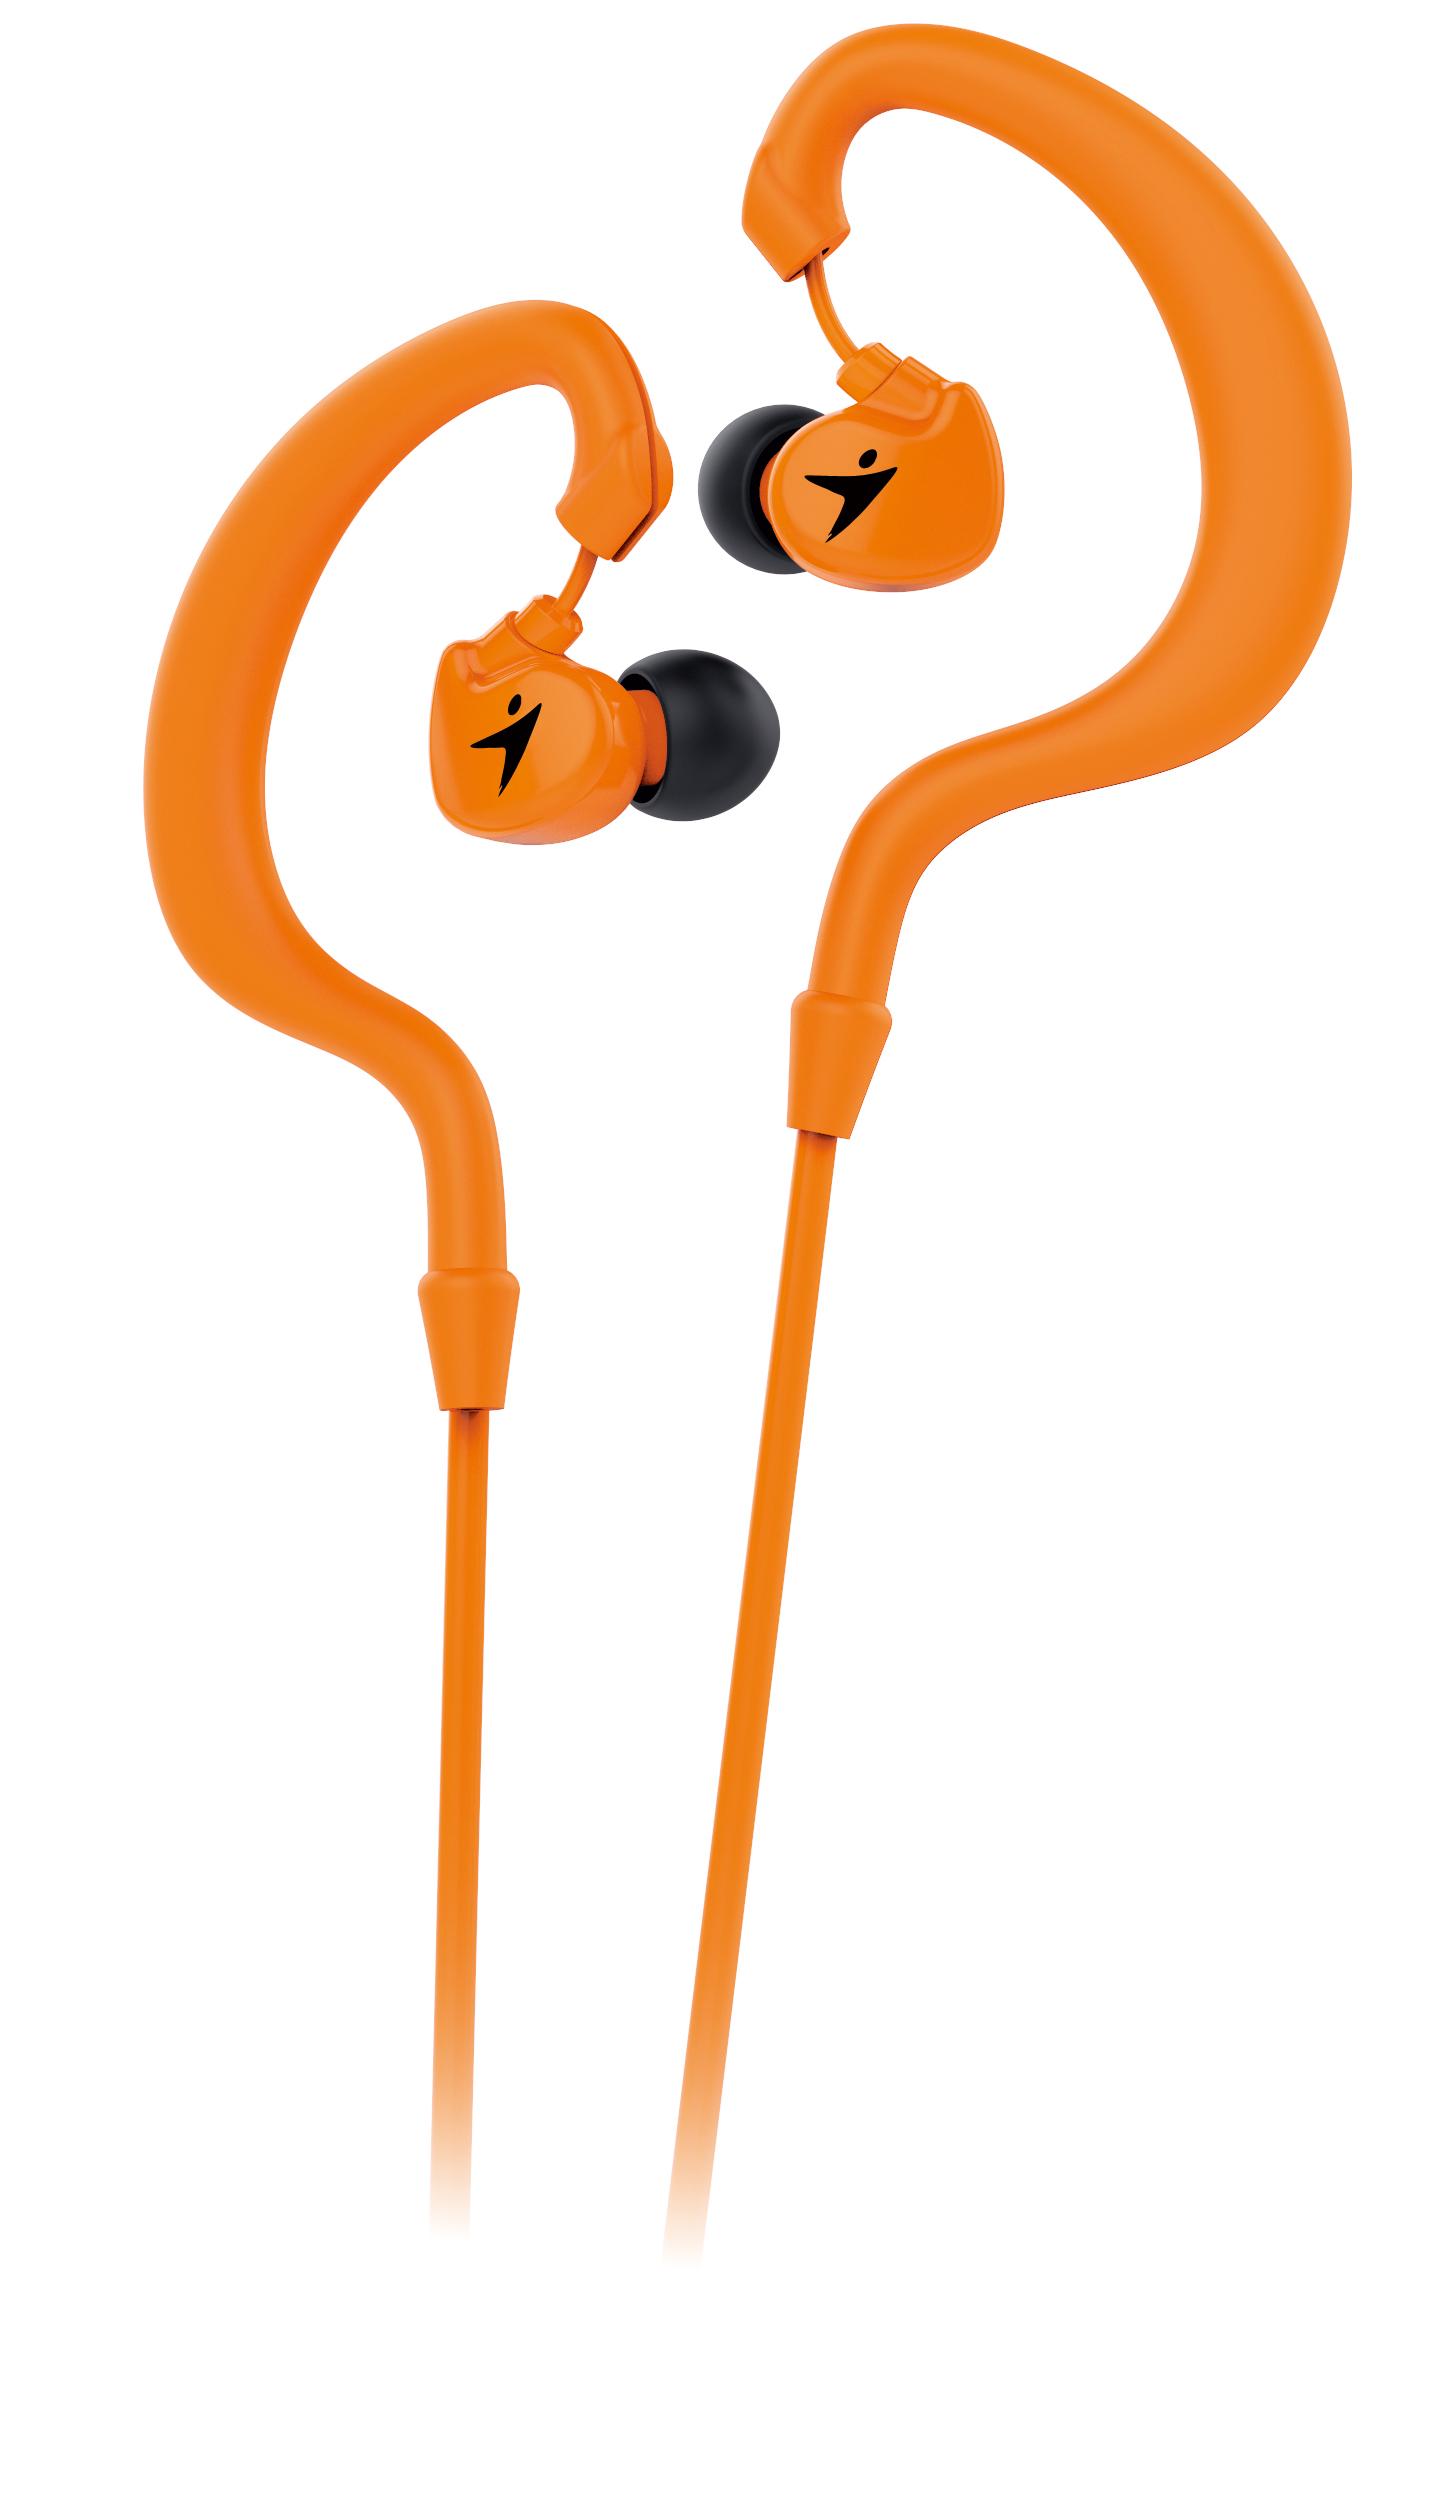 Wholesale headset : hs-m270,orange